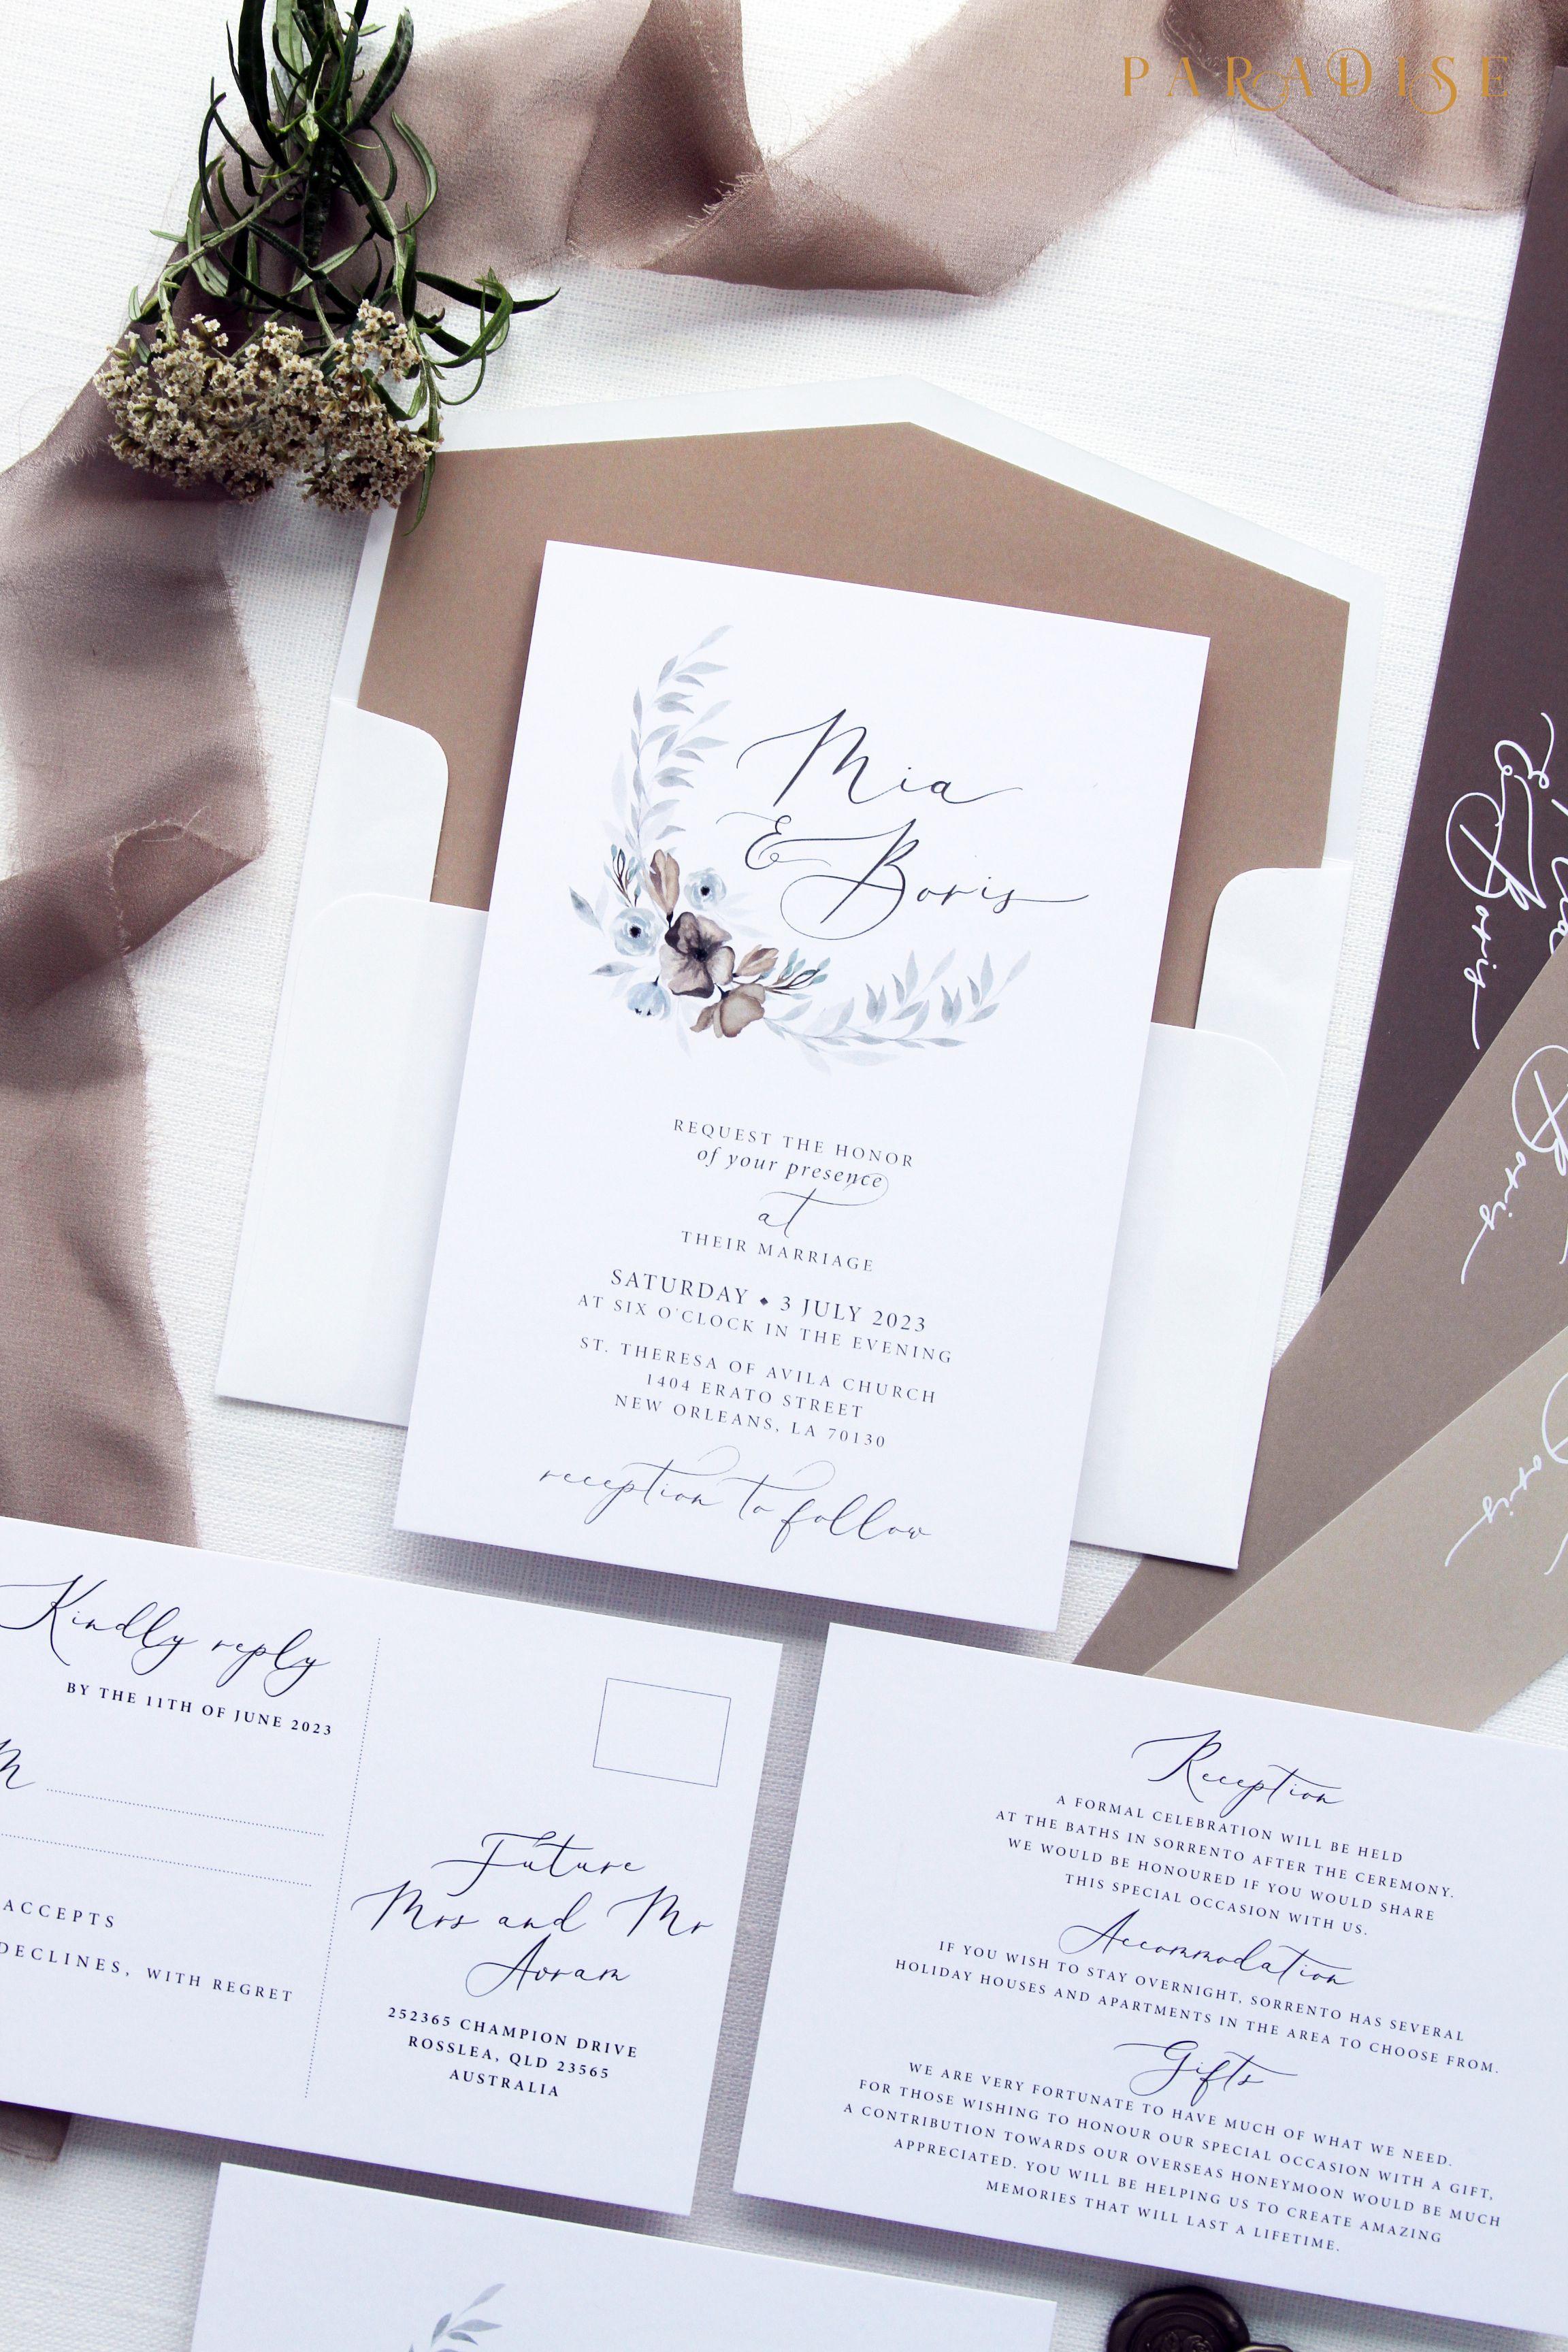 weddinginvitation #weddings #bride #weddingstationery ...